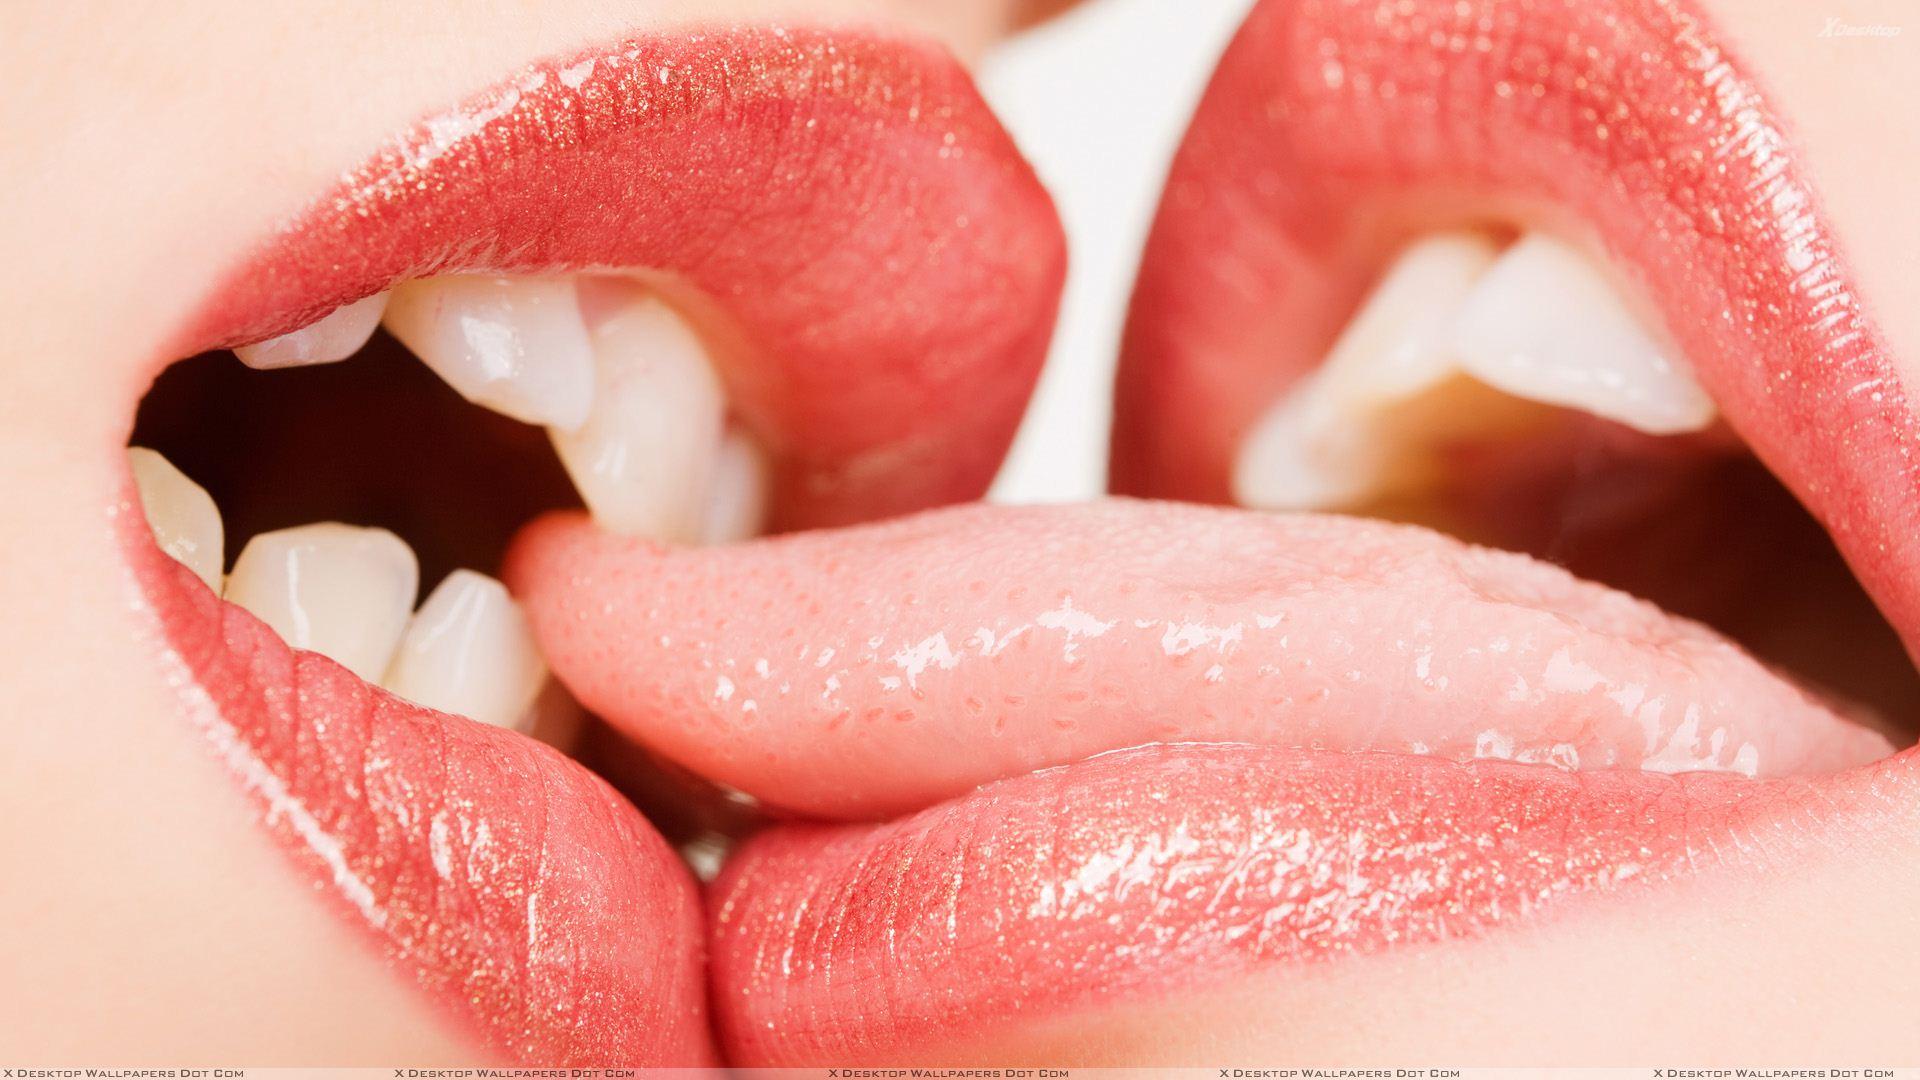 lips | Red Glossy Lips Kissing Wallpaper | One Last Kiss